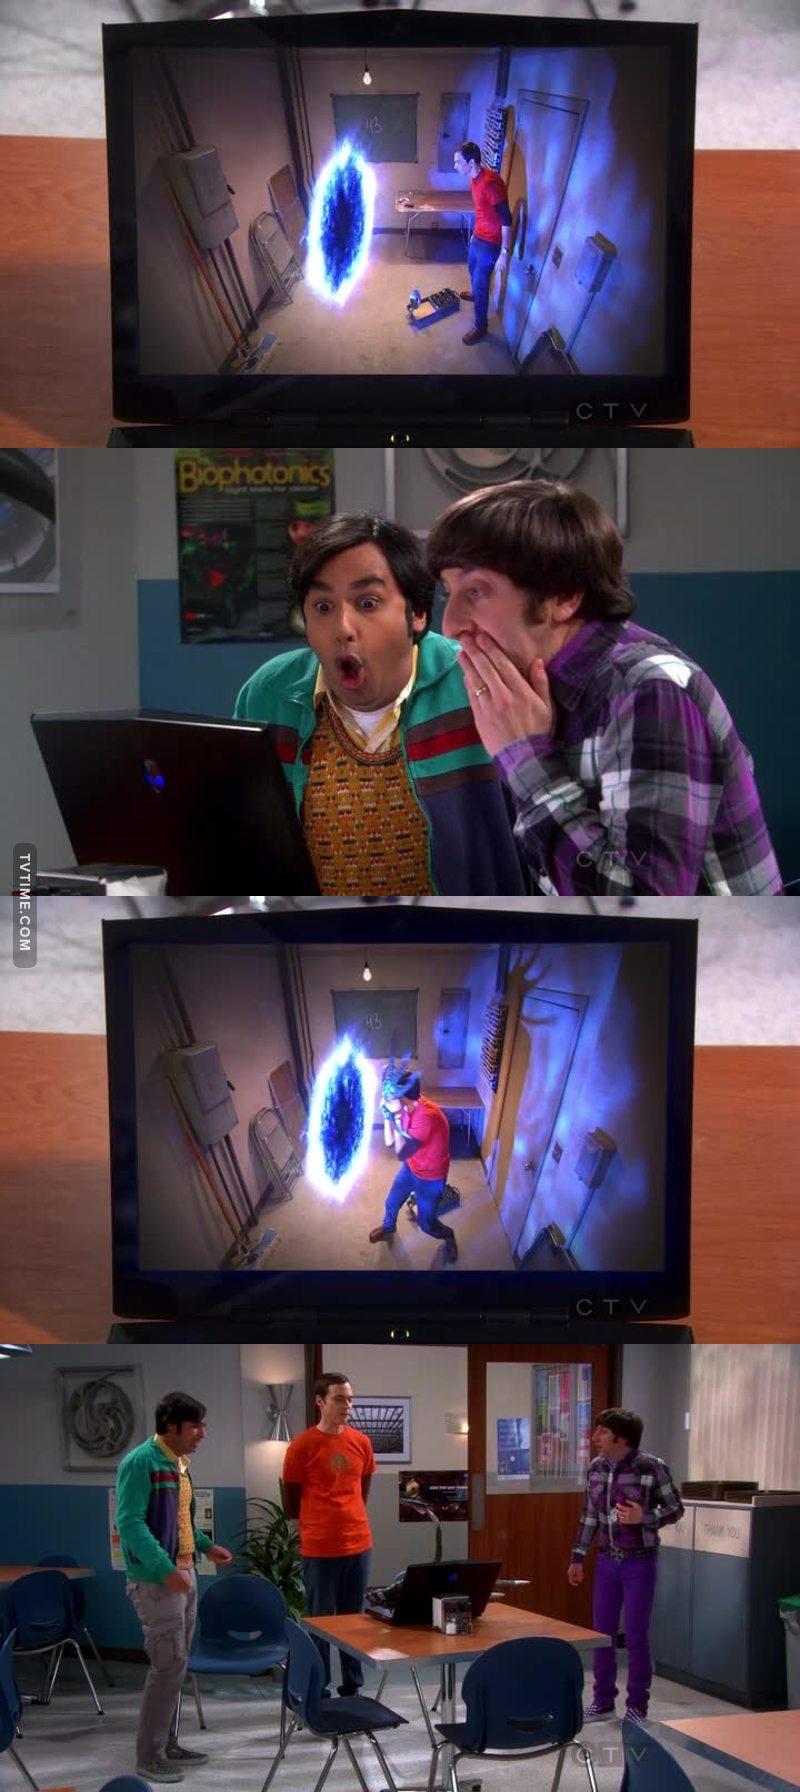 LOL Sheldon, that's brilliant!